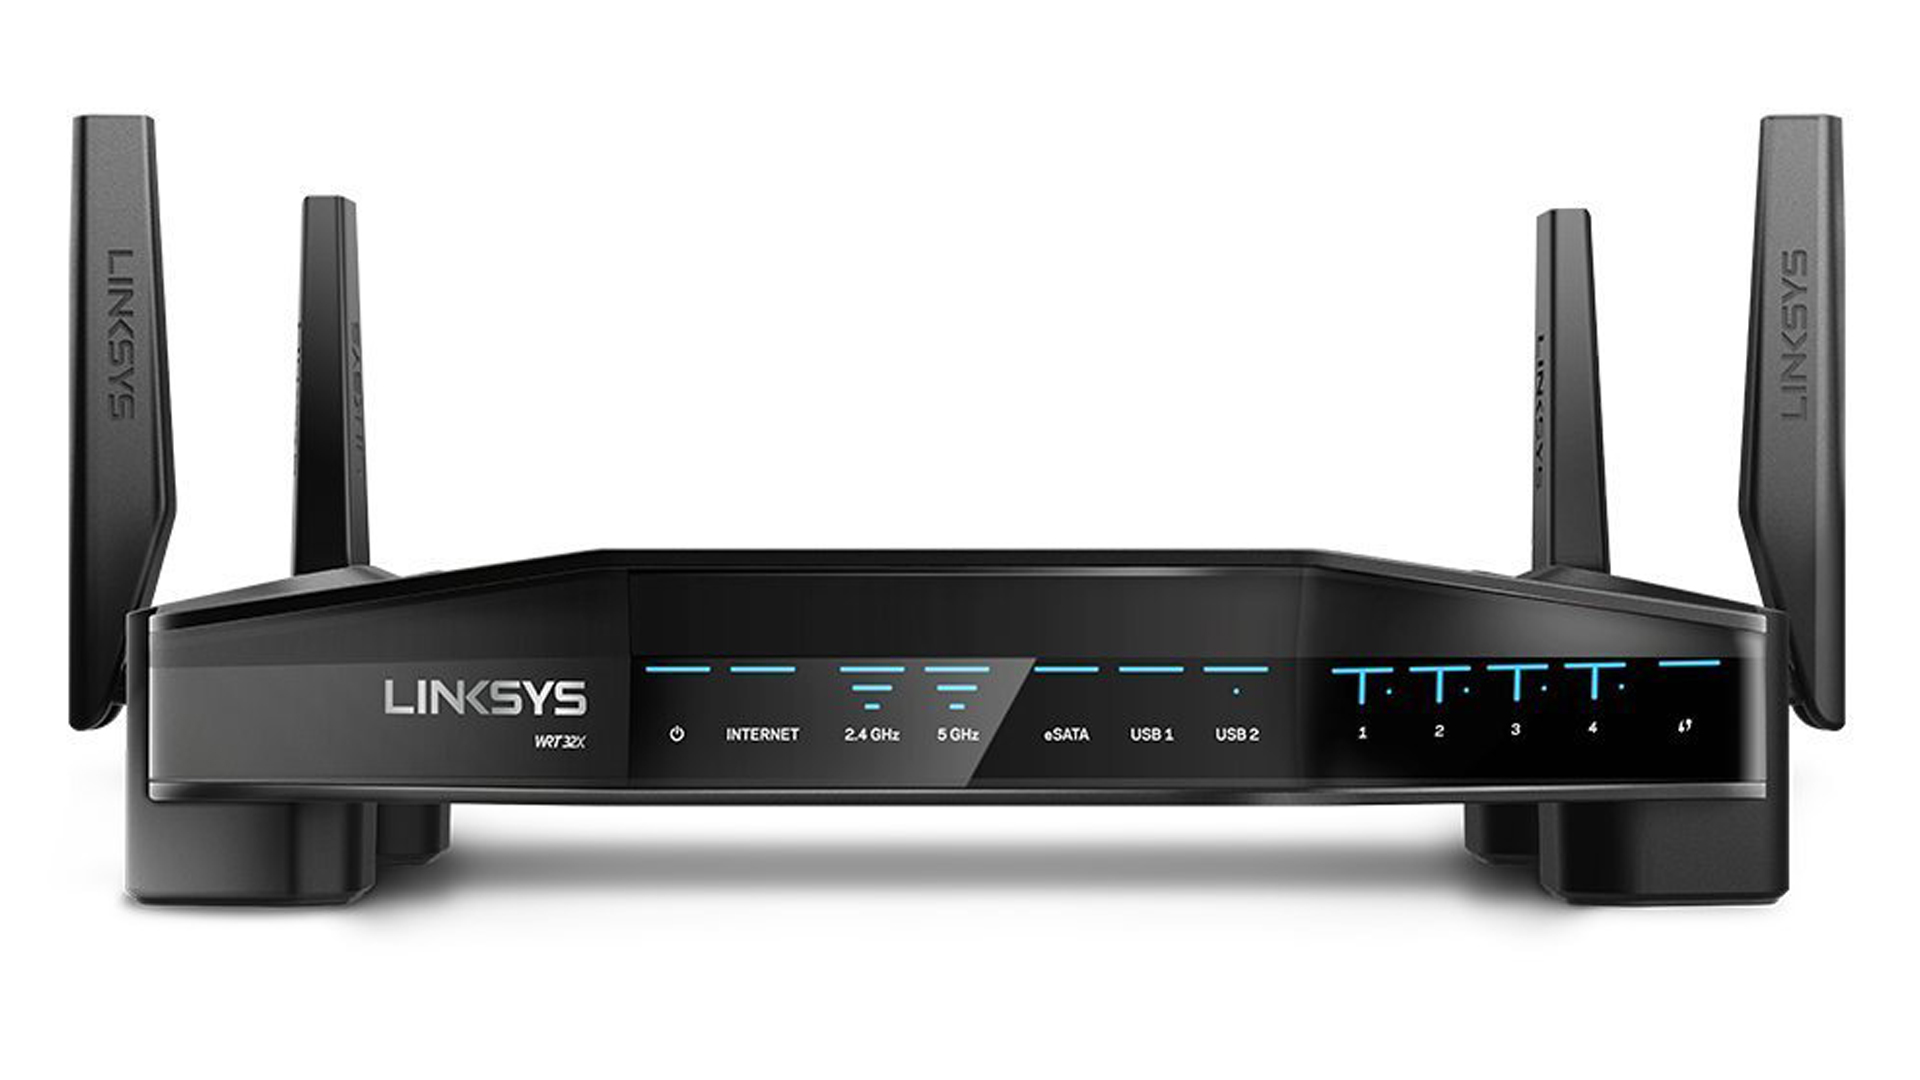 linksys wrt32x gaming router gadget reviews popzara press